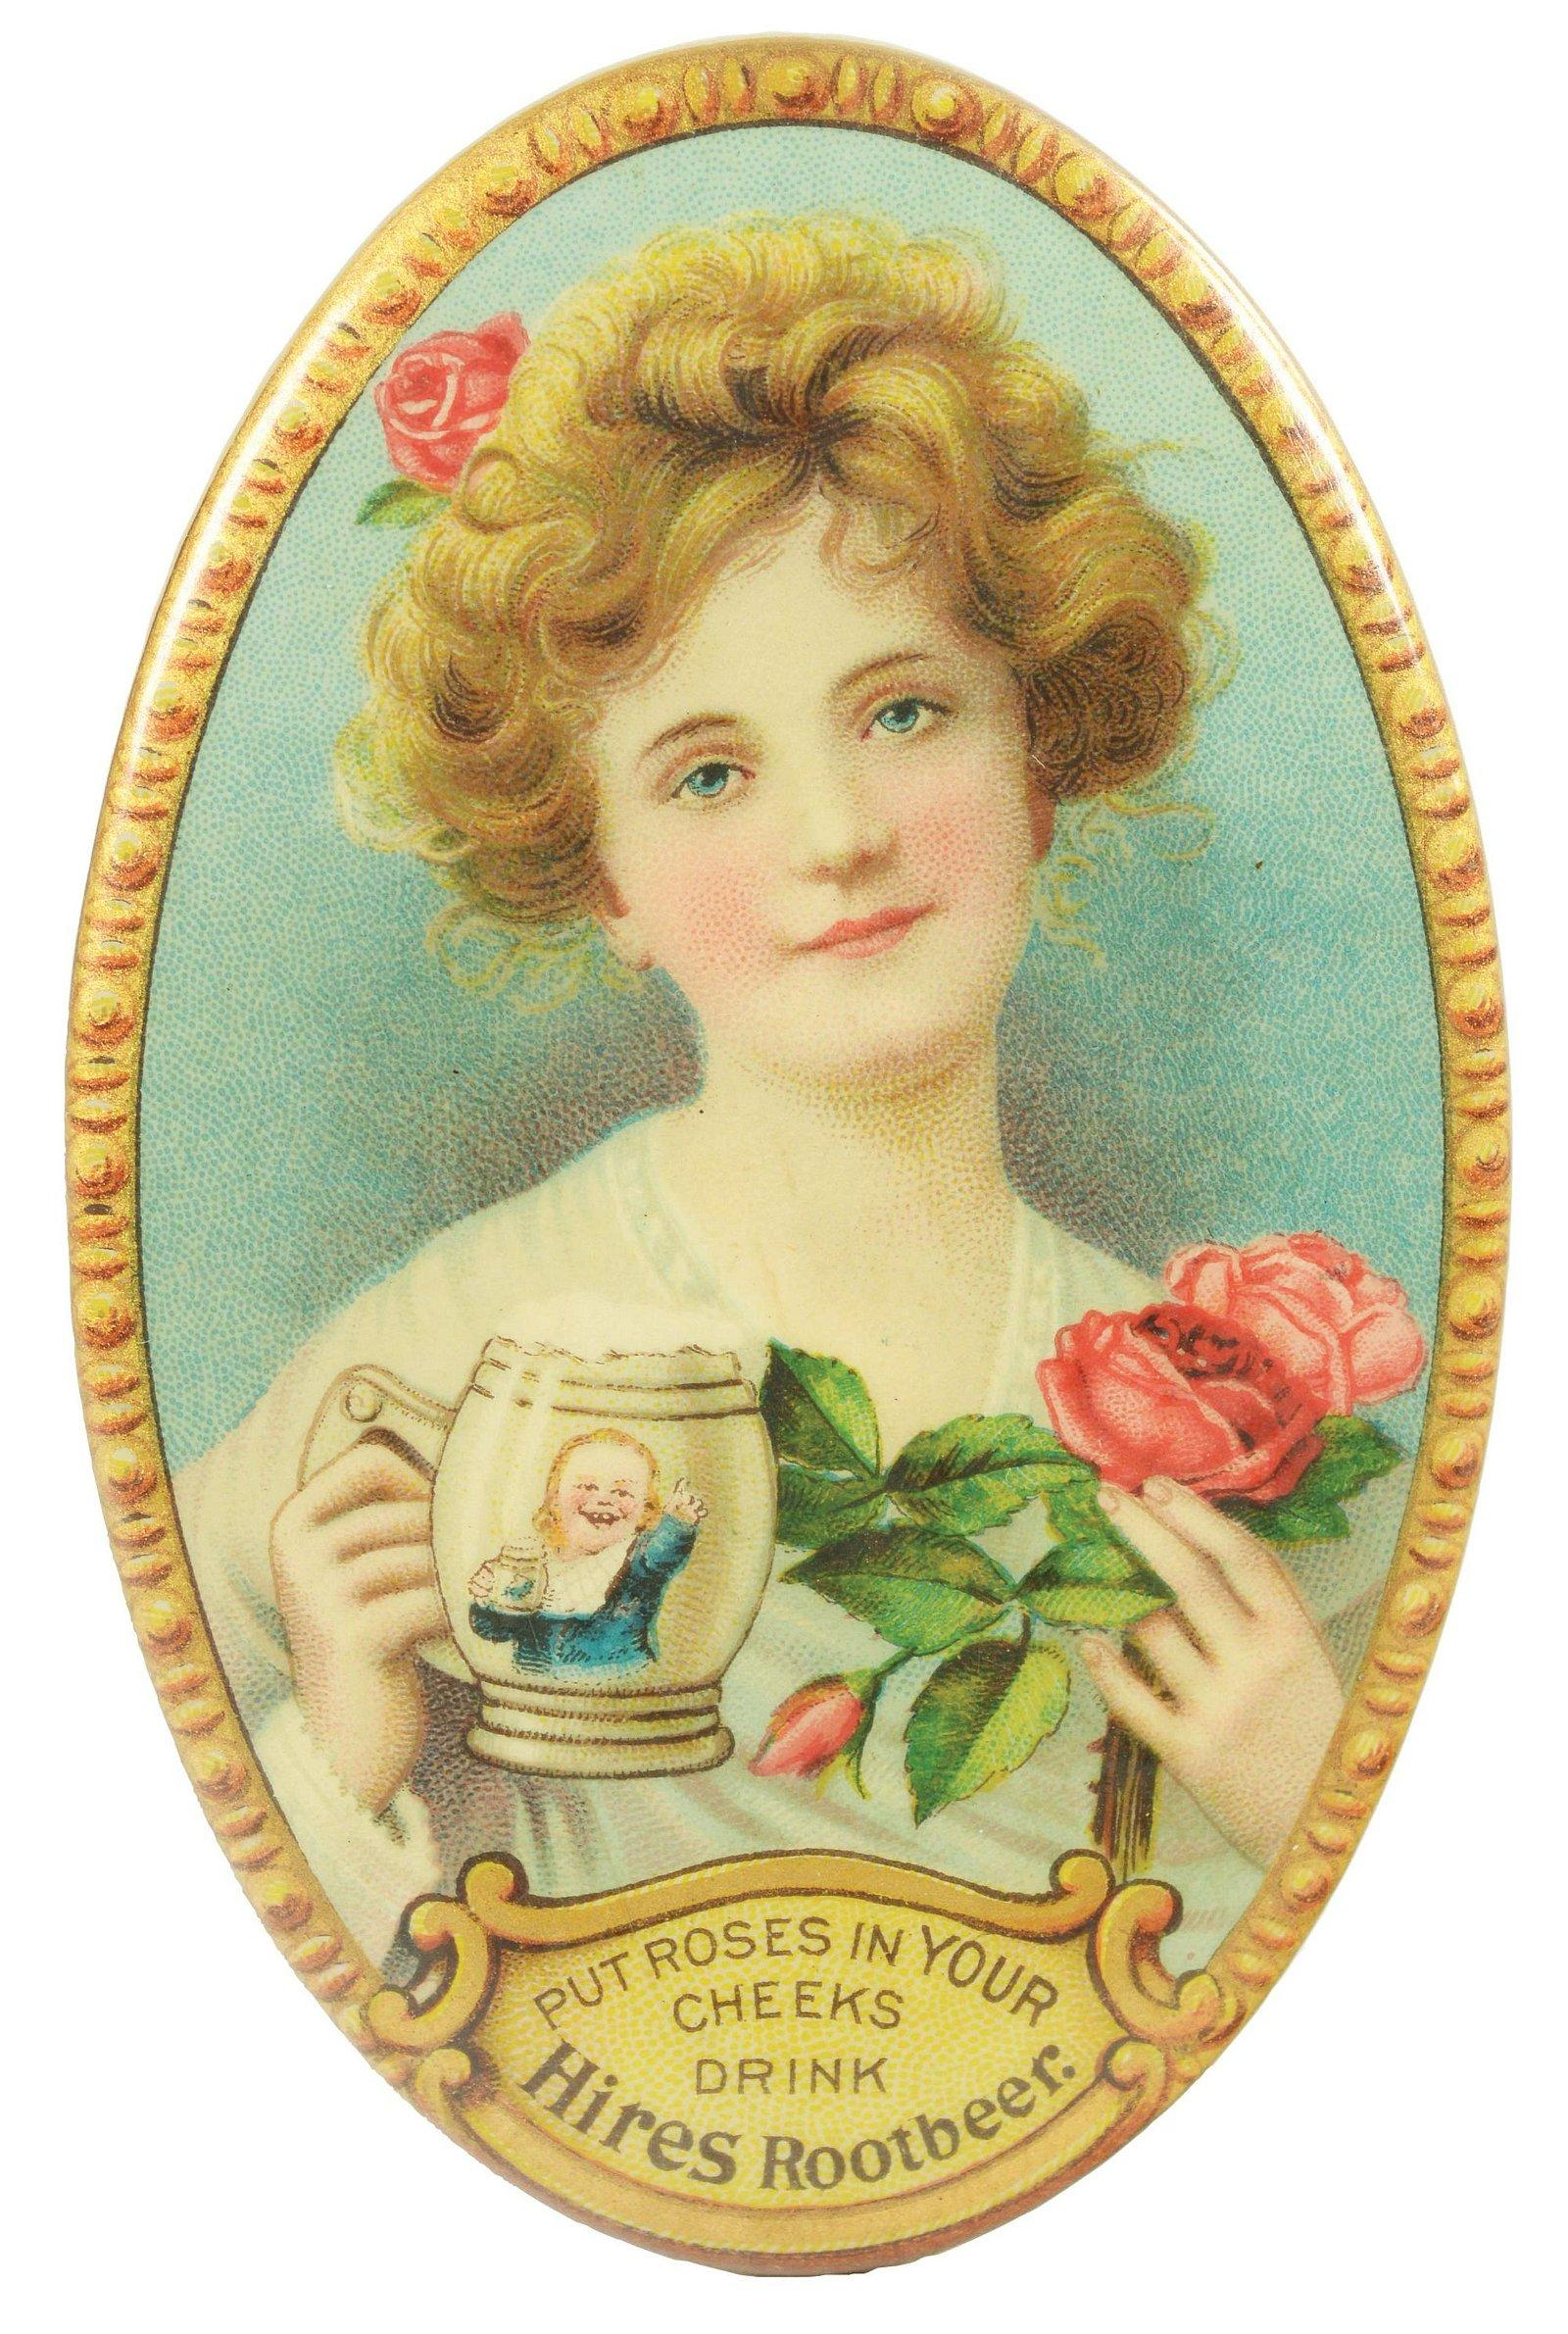 Circa 1905 Hires Root Beer Pocket Mirror.